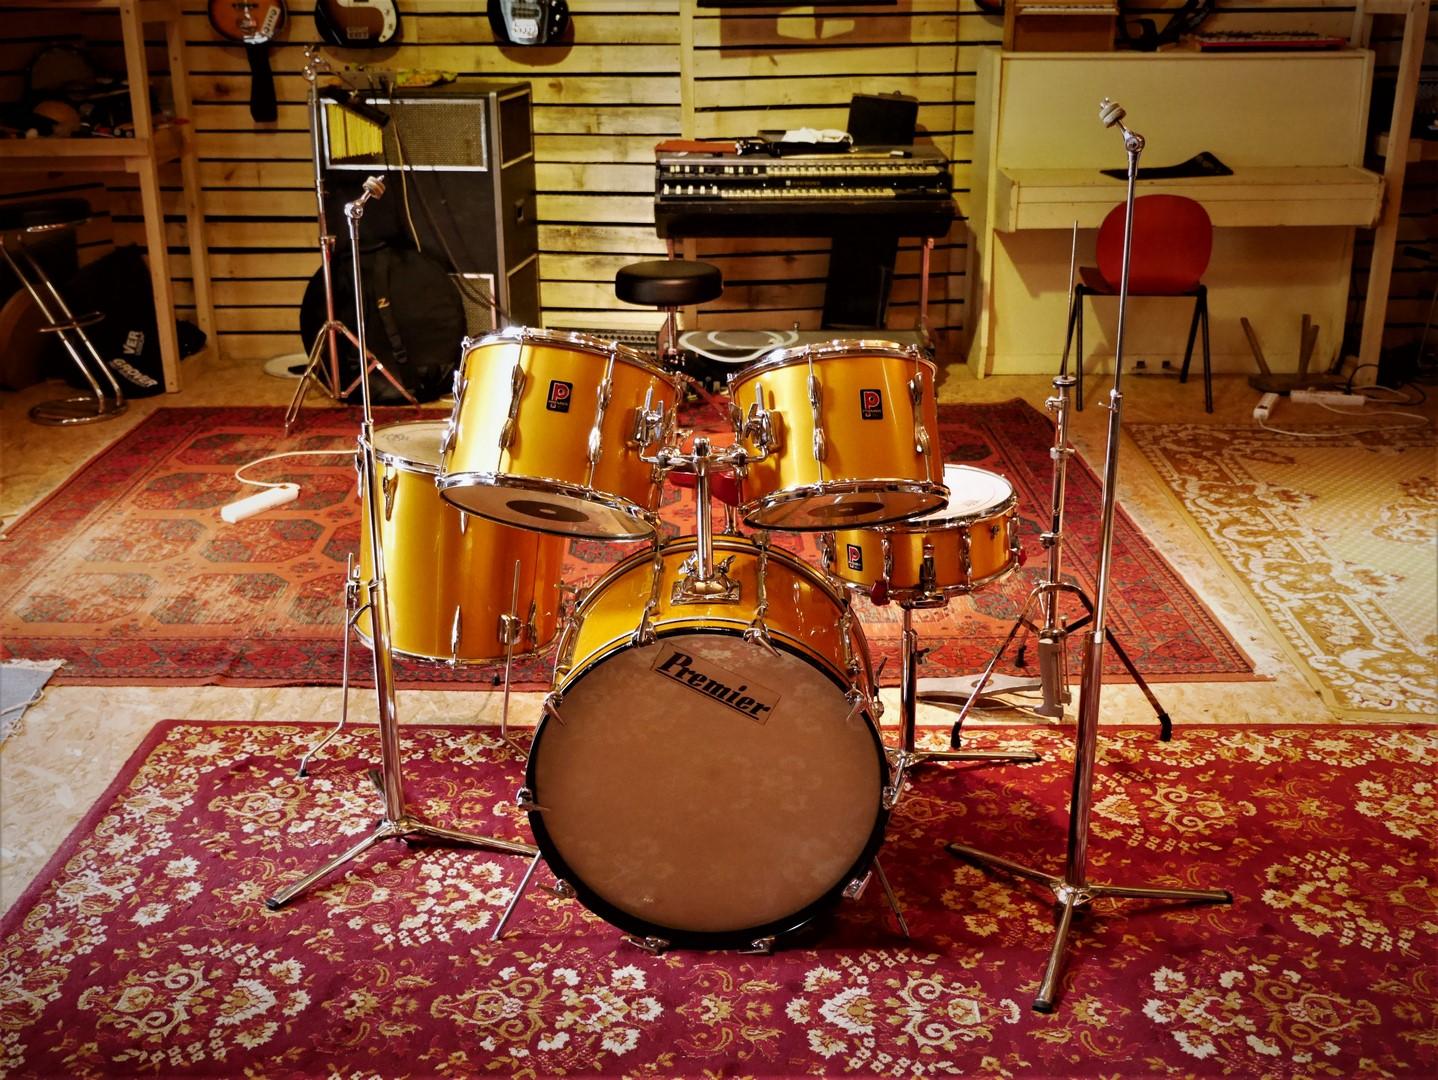 studio-la-boite-a-meuh-premier-resonator